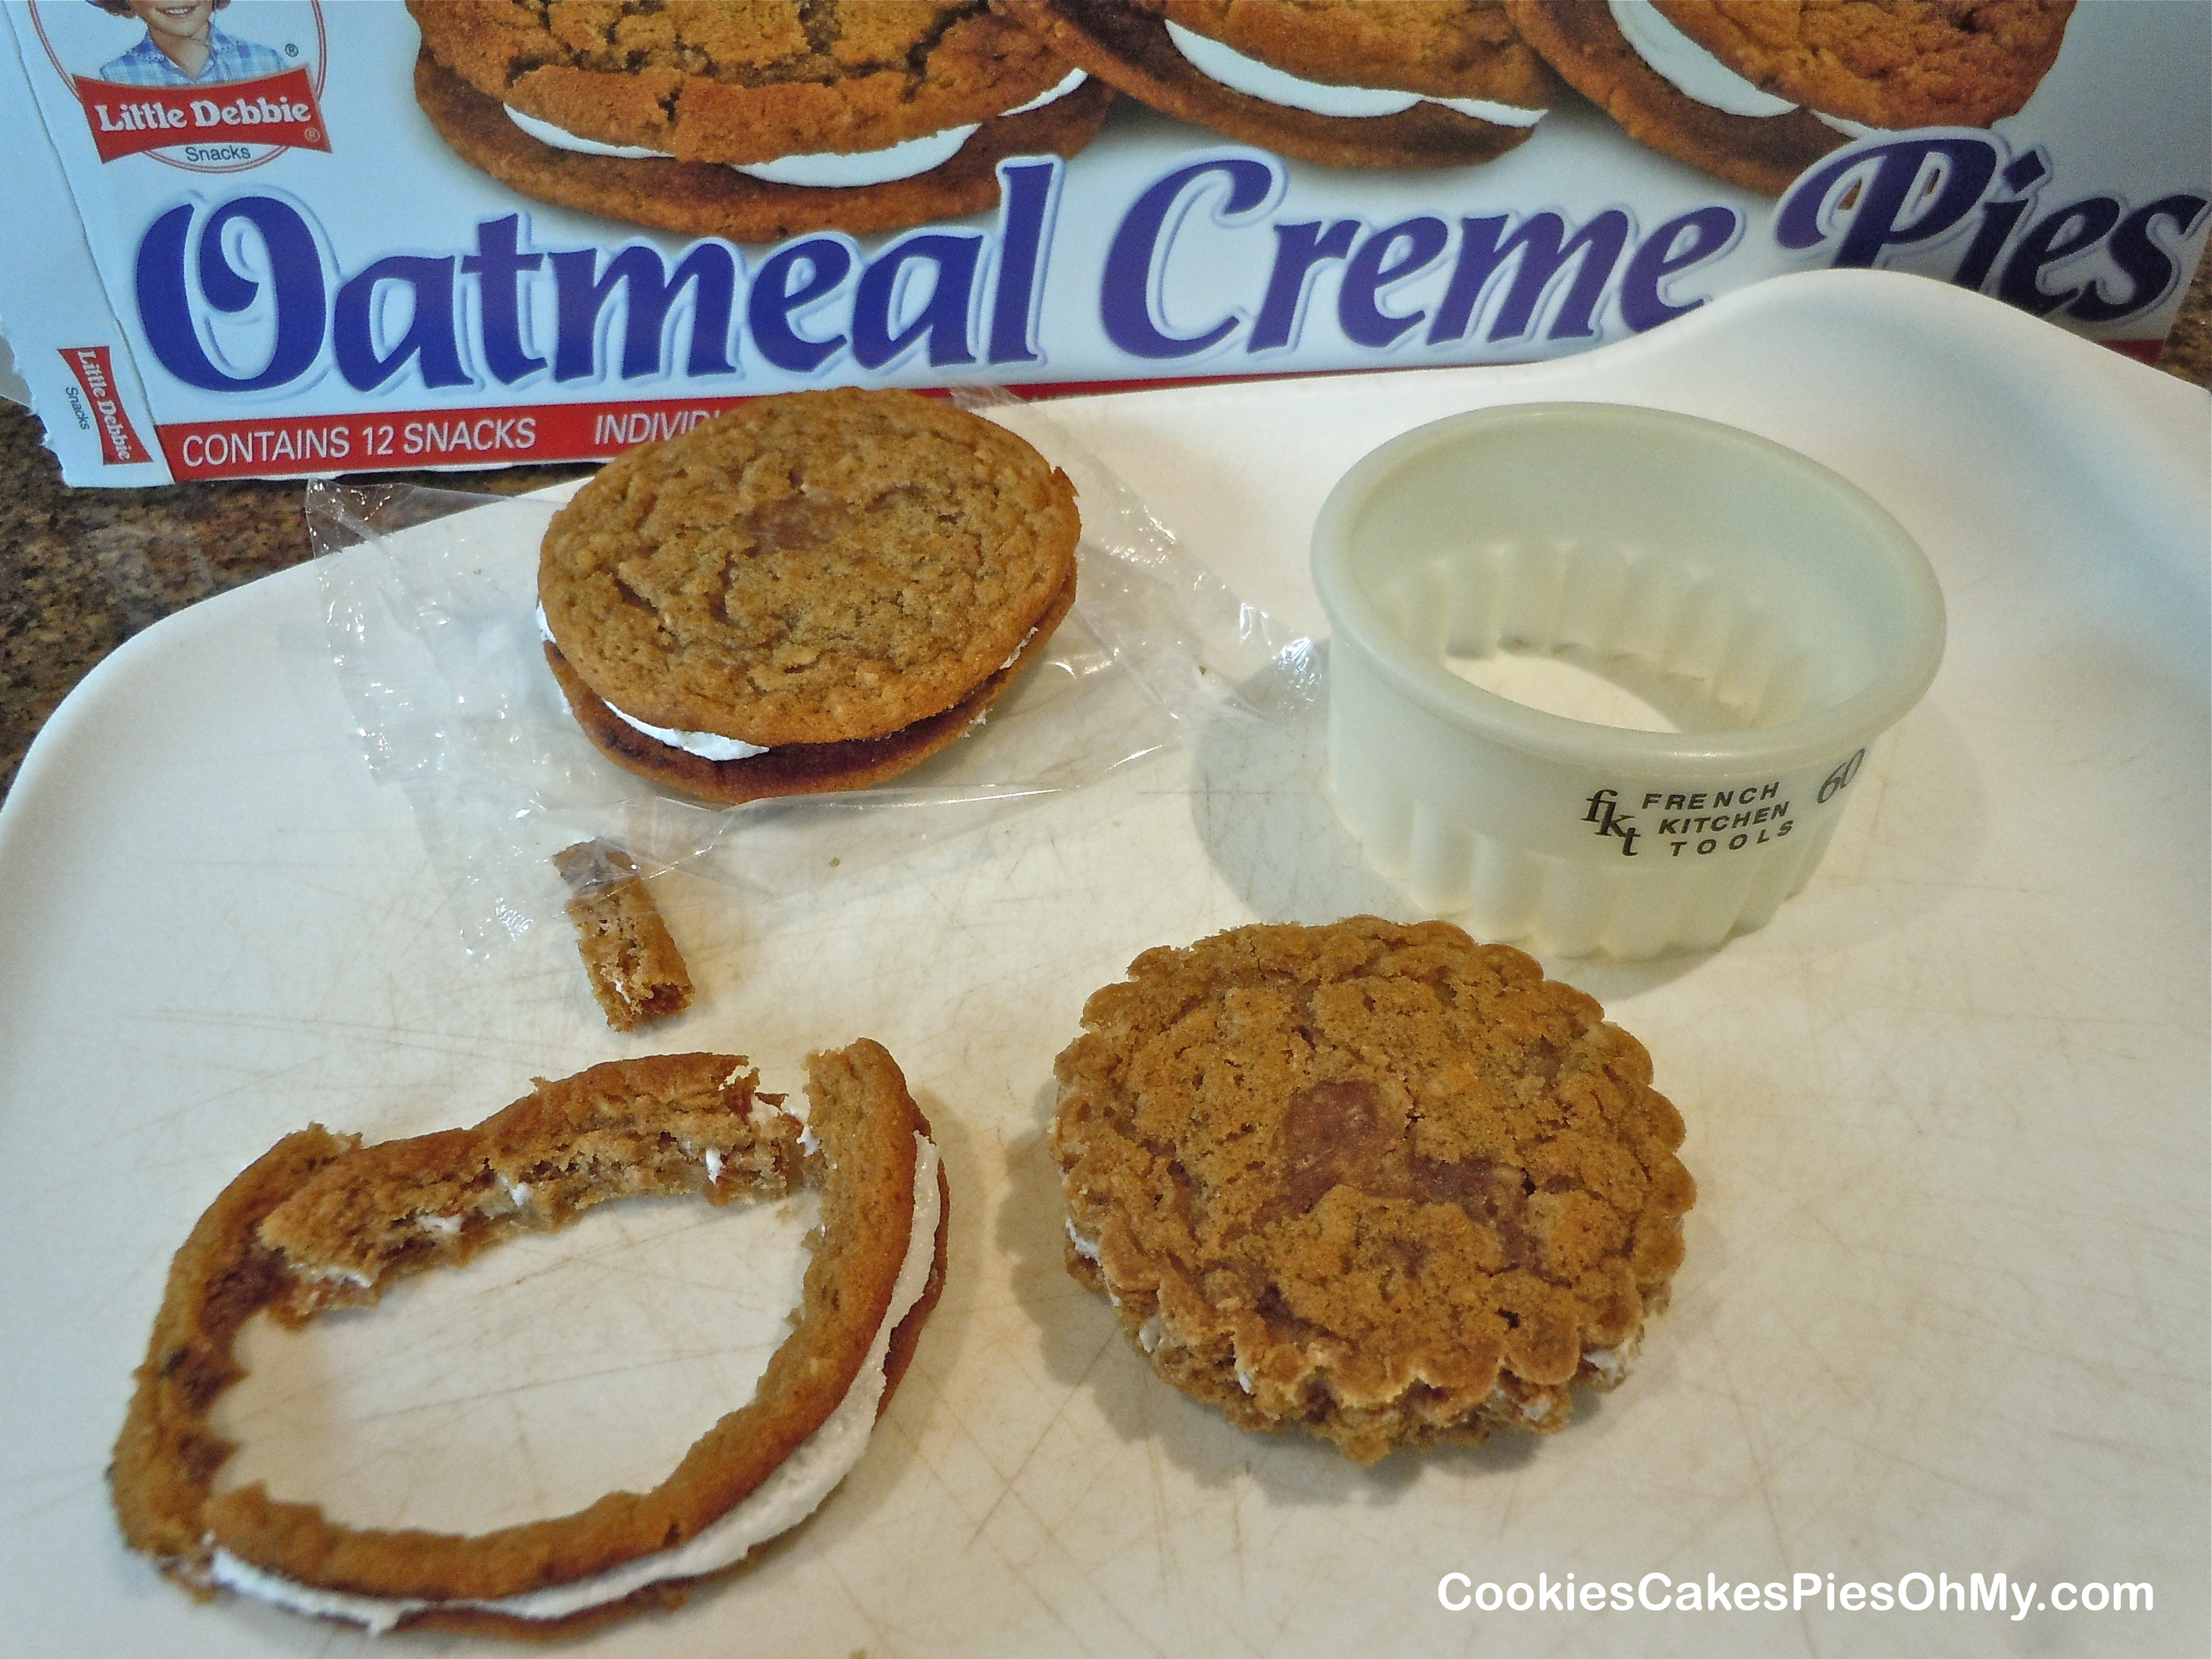 Oatmeal Creme Pie Cupcakes | CookiesCakesPiesOhMy